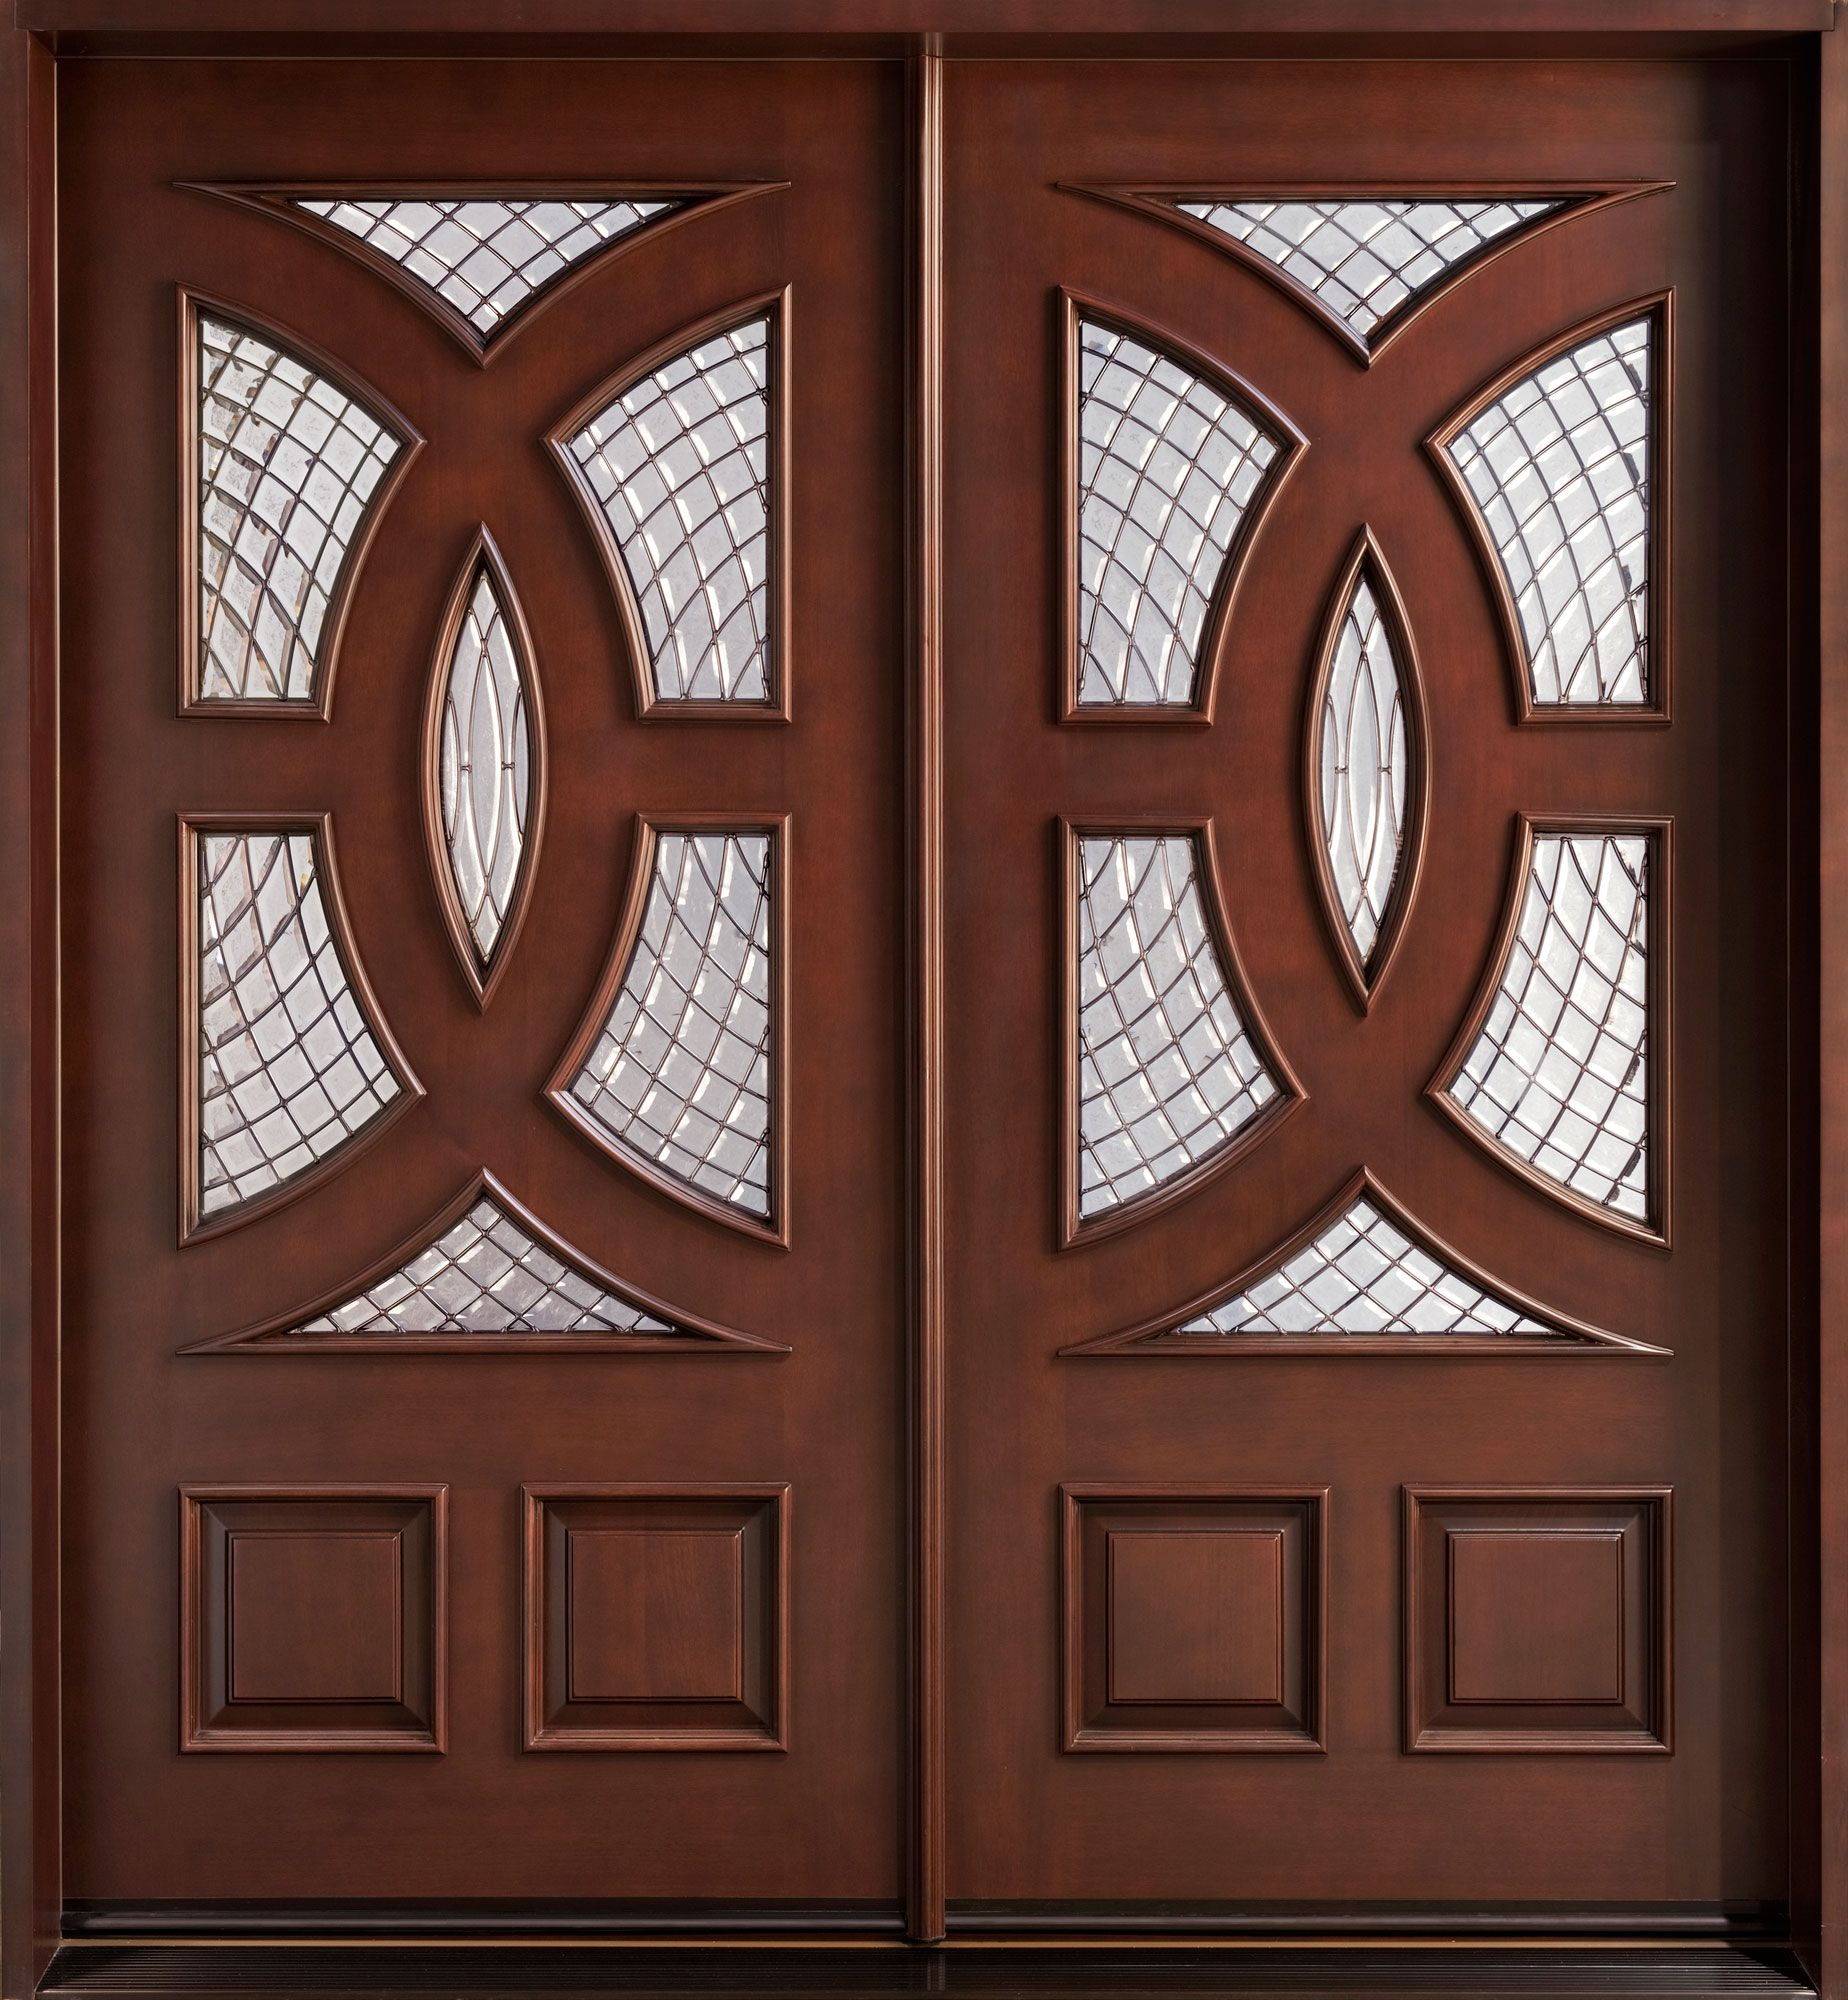 Brown mahogany wood entry panel door with frosted glass marvelous brown mahogany wood entry panel door with frosted glass marvelous design of modern entry doors rubansaba